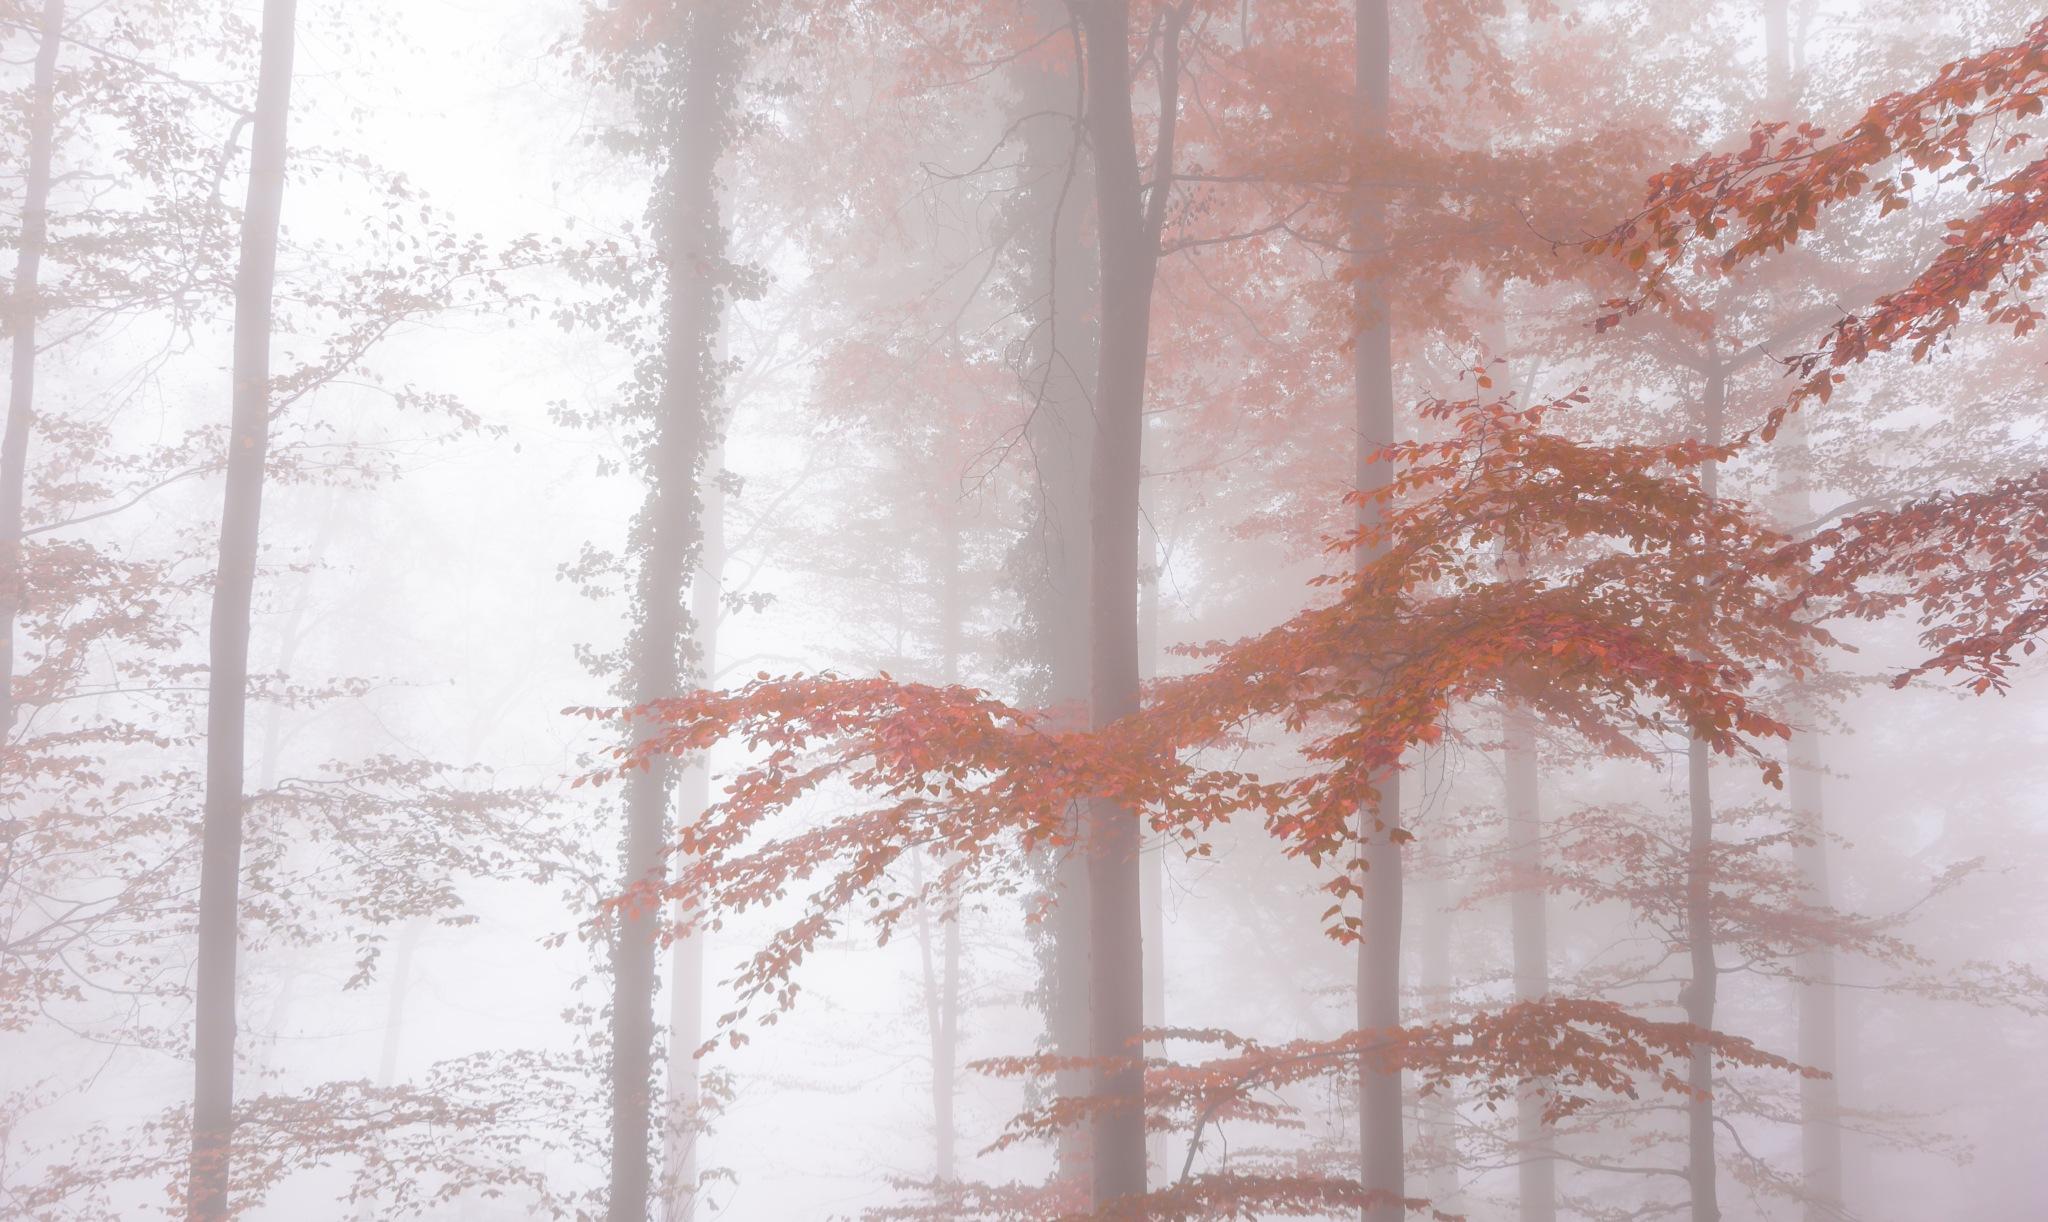 Morning mist by Sivakumar